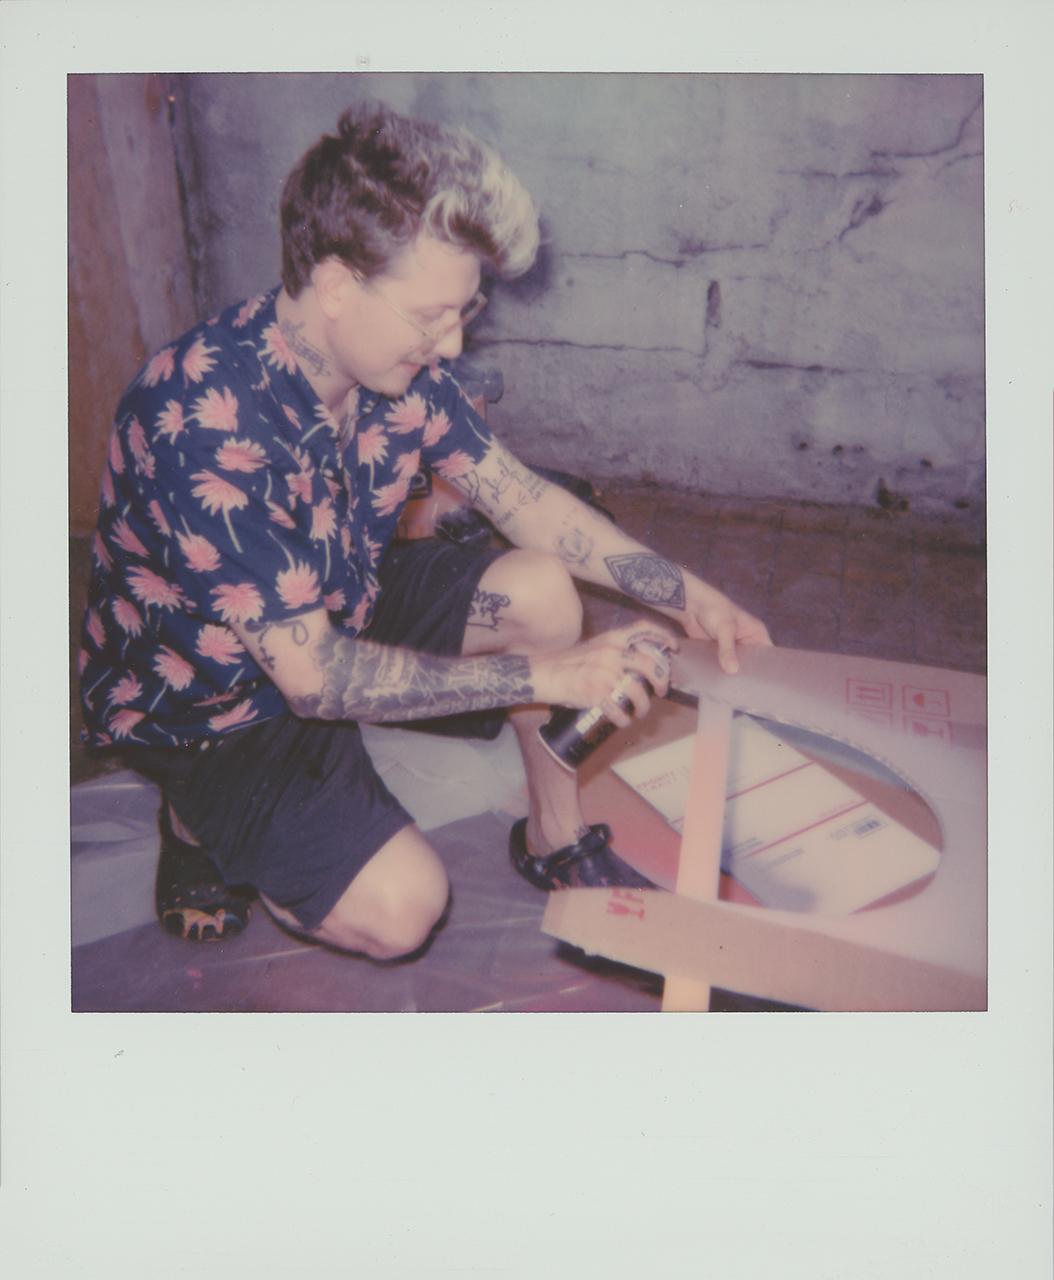 Brandon Sines on Polaroid 600 film